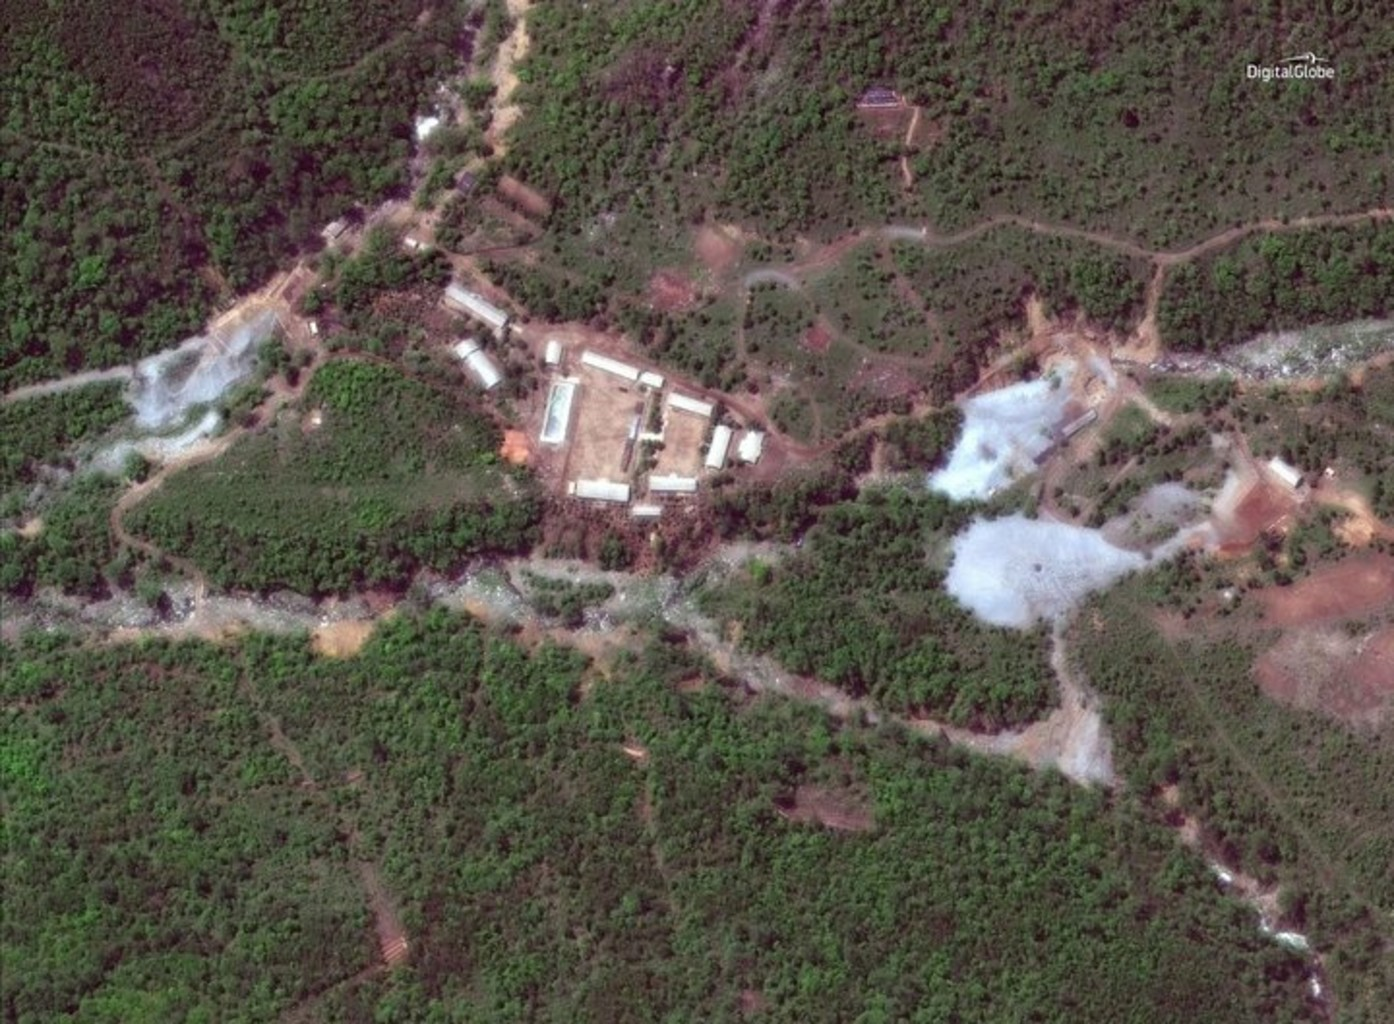 Снимок ядерного полигона КНДР за сутки до уничтожения. Фото: twitter.com/DigitalGlobe